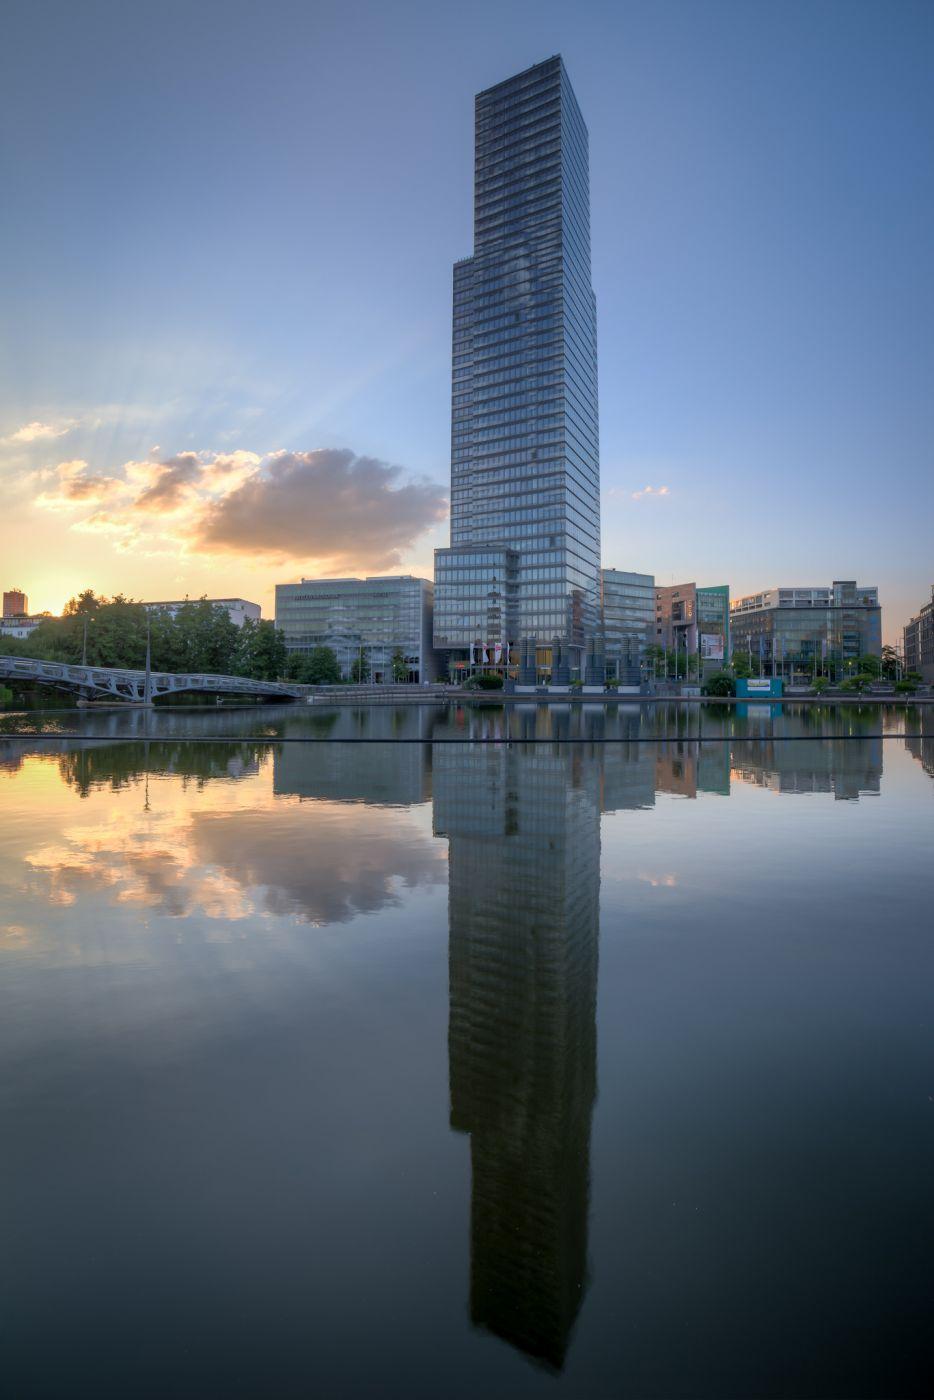 Kölnturm and lake at Mediapark, Germany